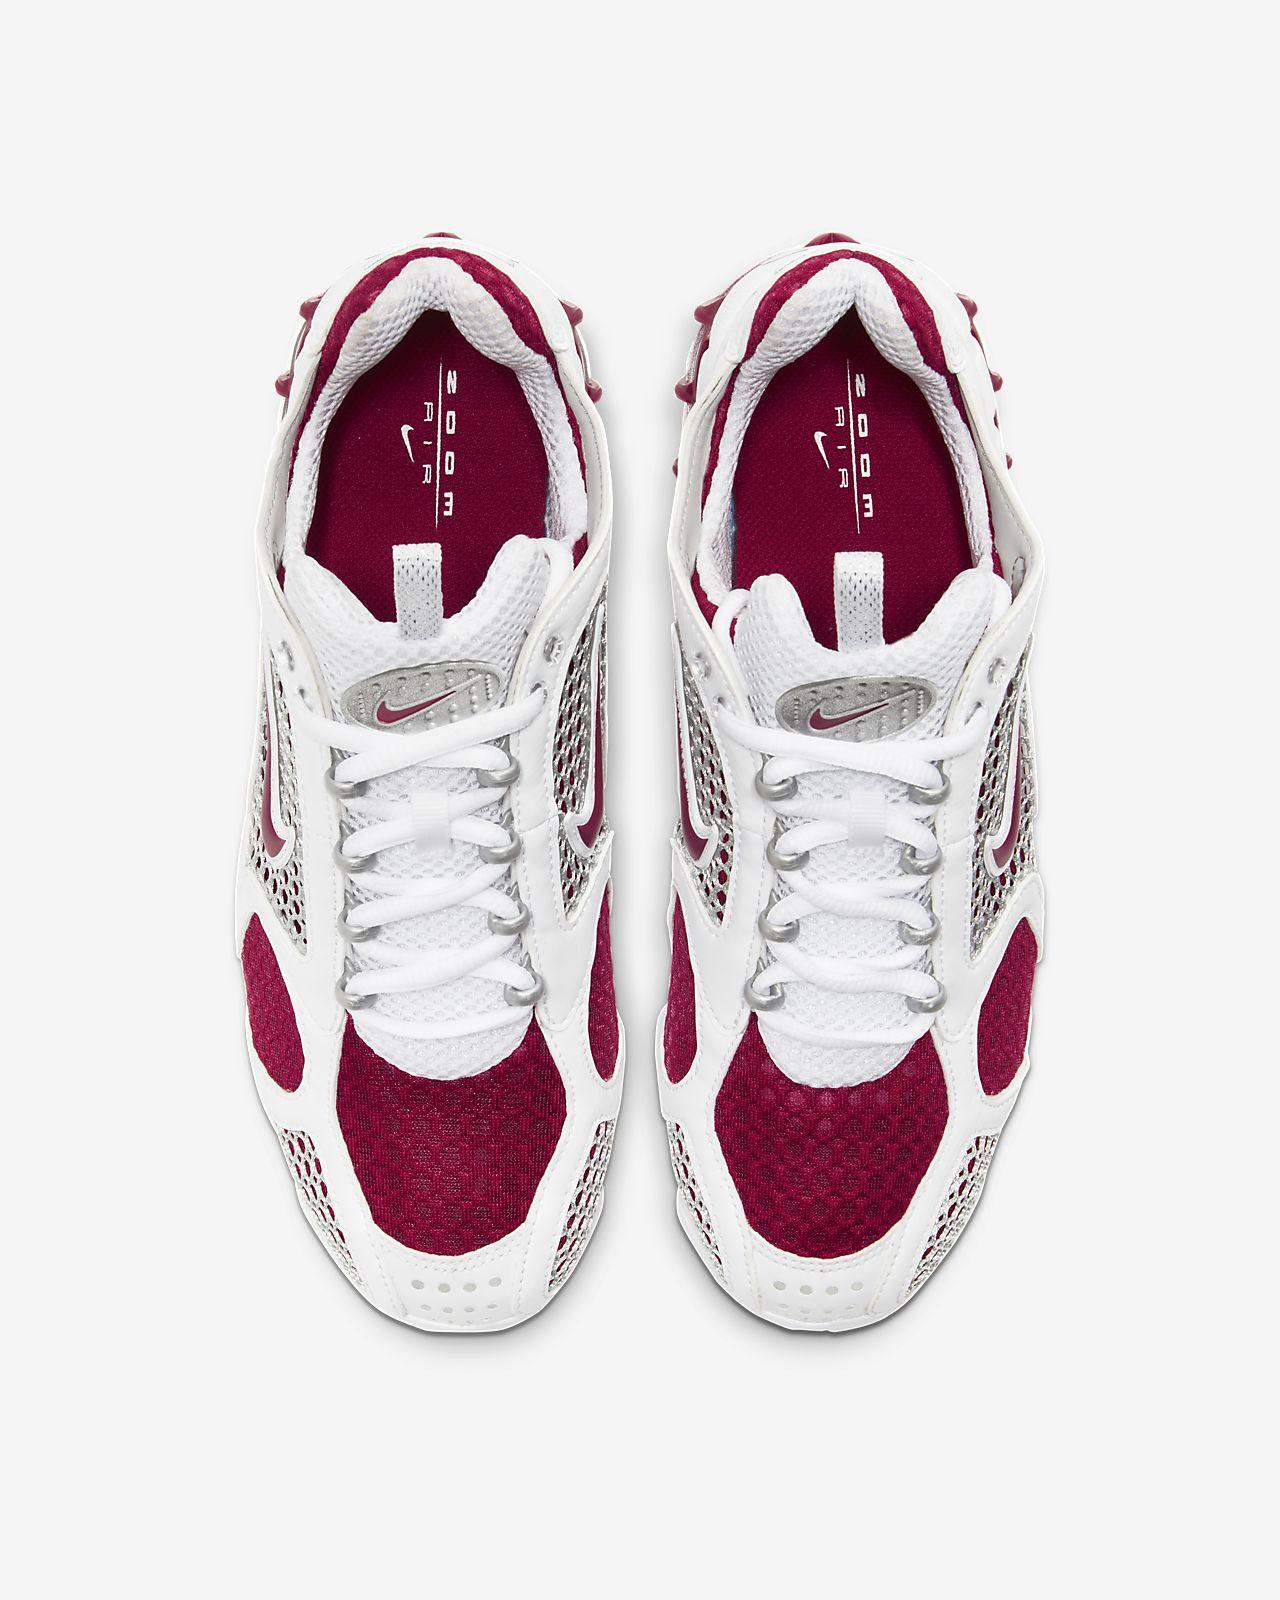 Nike Air Zoom Spiridon Cage 2 Damesschoen